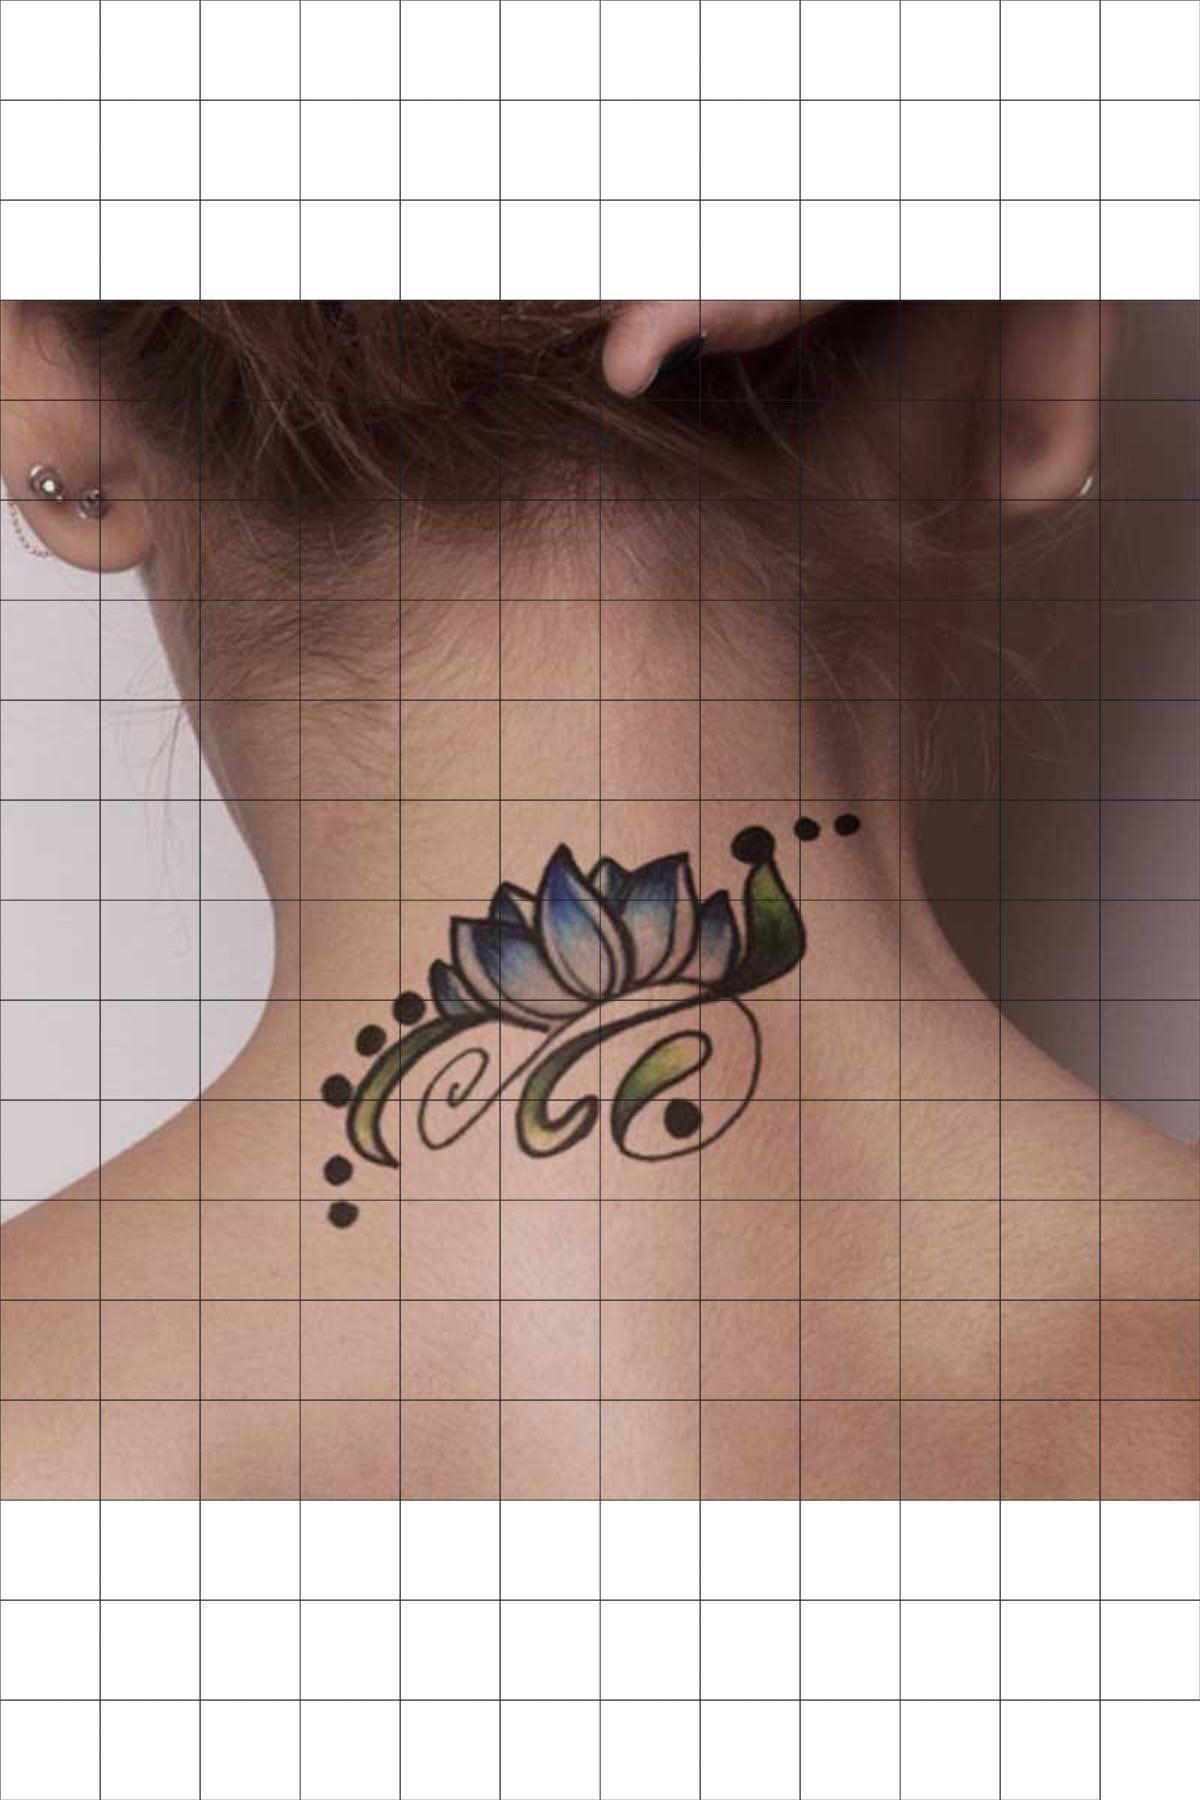 TatFast Lotus 218 Geçici Dövme Flash Tattoo 1